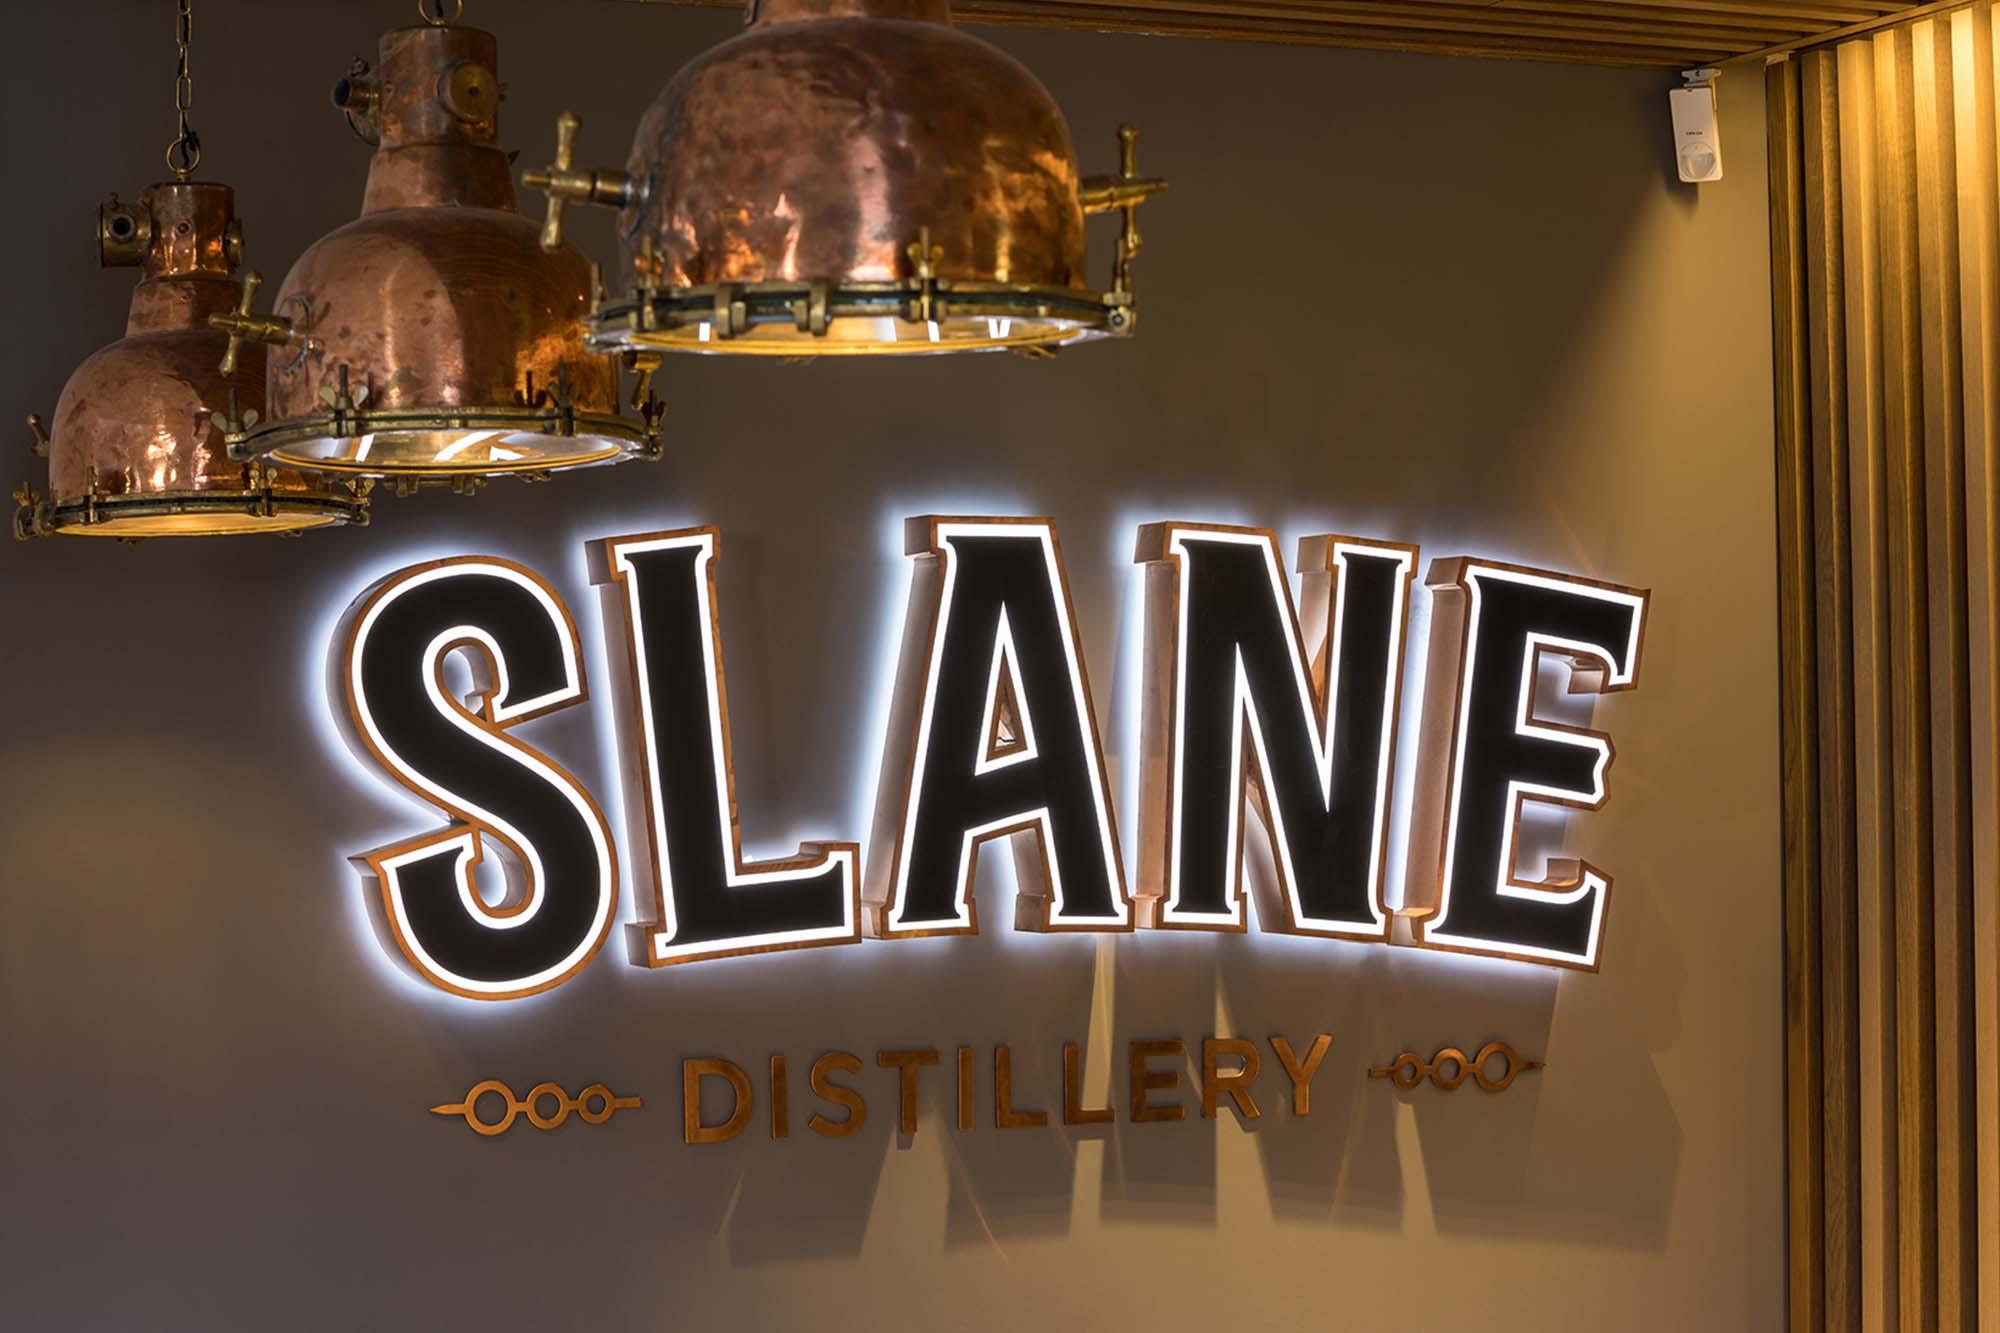 Cover image: Slane Distillery